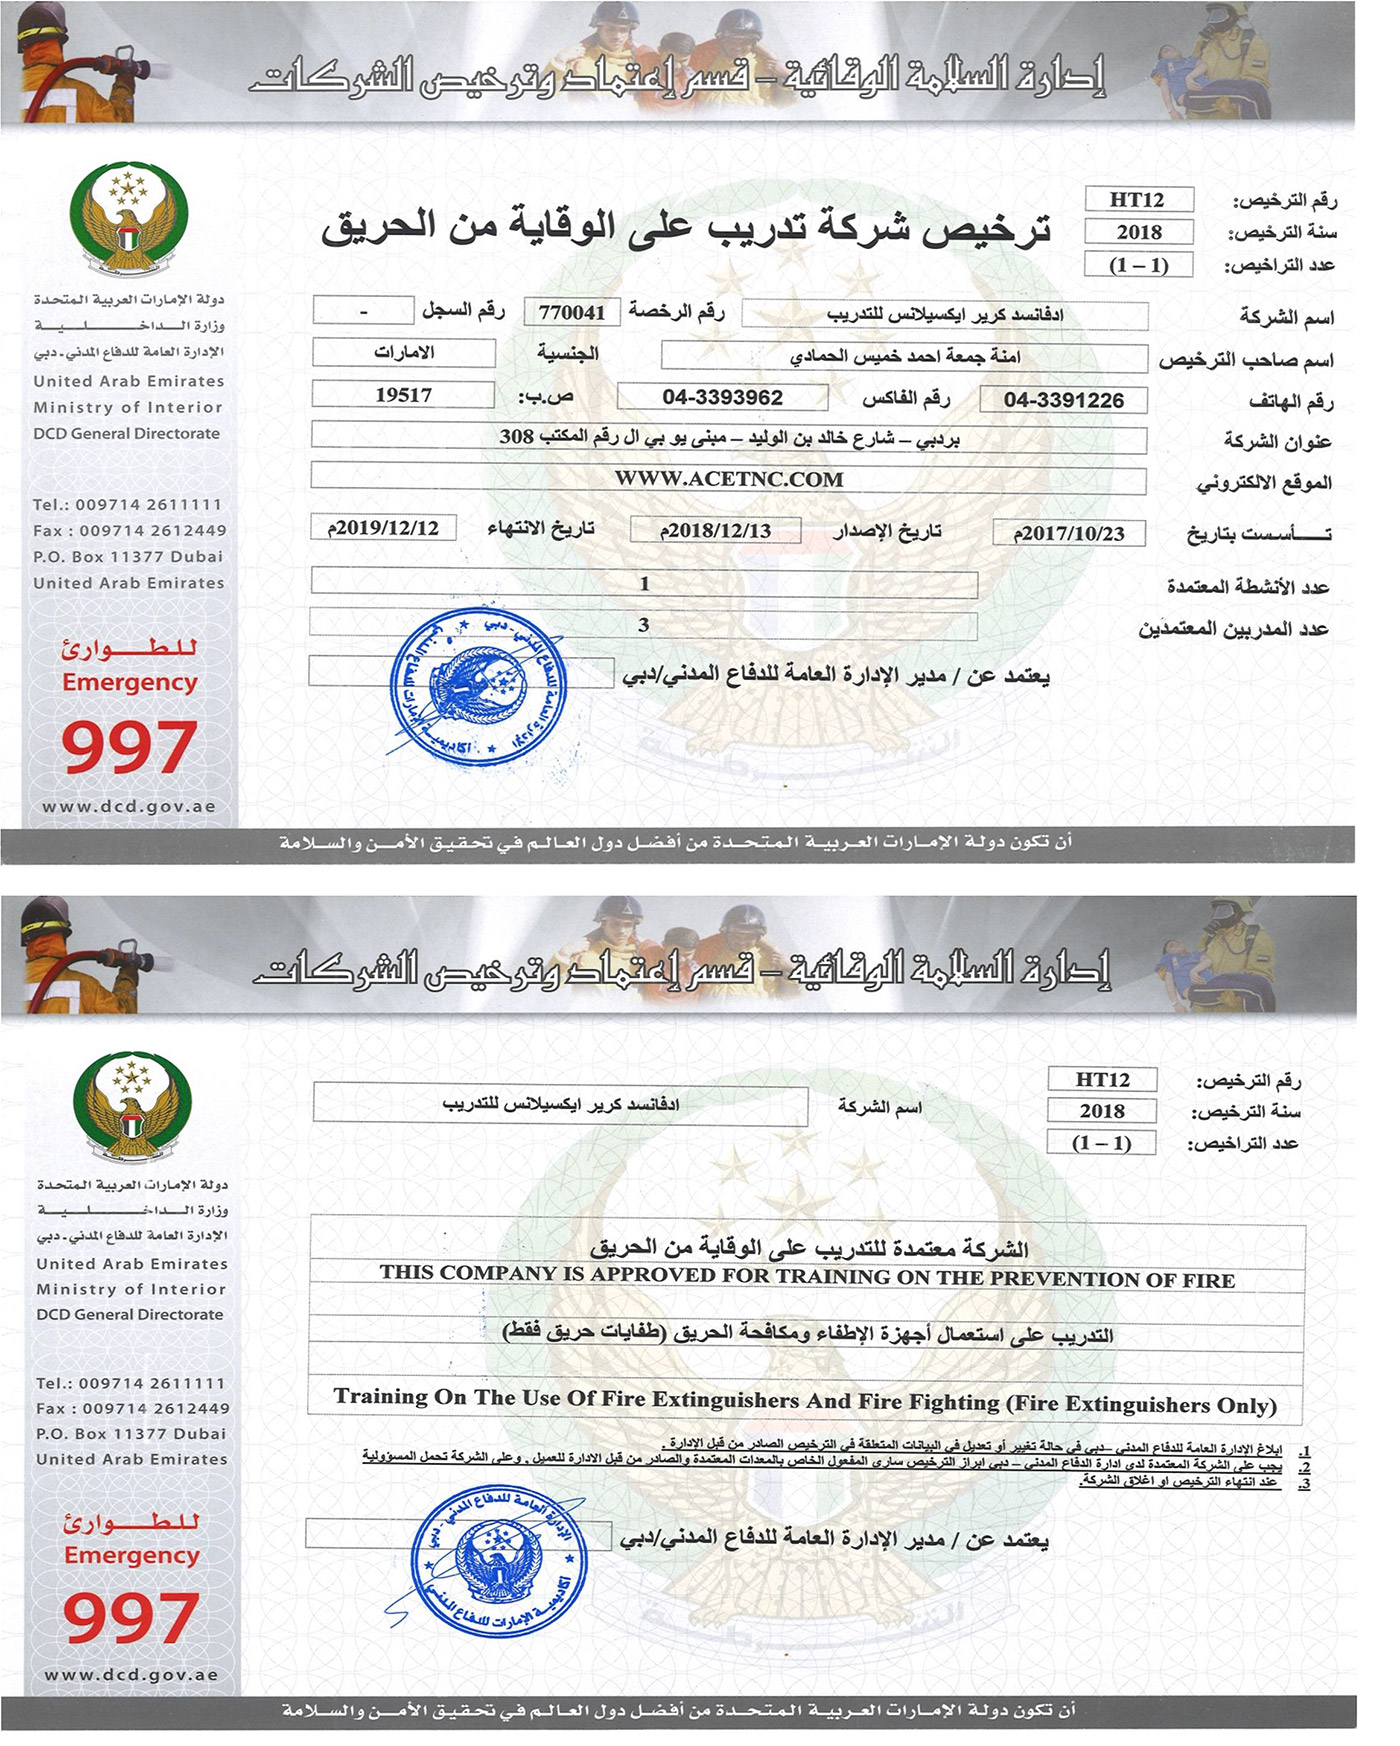 Dubai Civil Defence - ACE Training and Consulting | Nebosh IGC |HSW